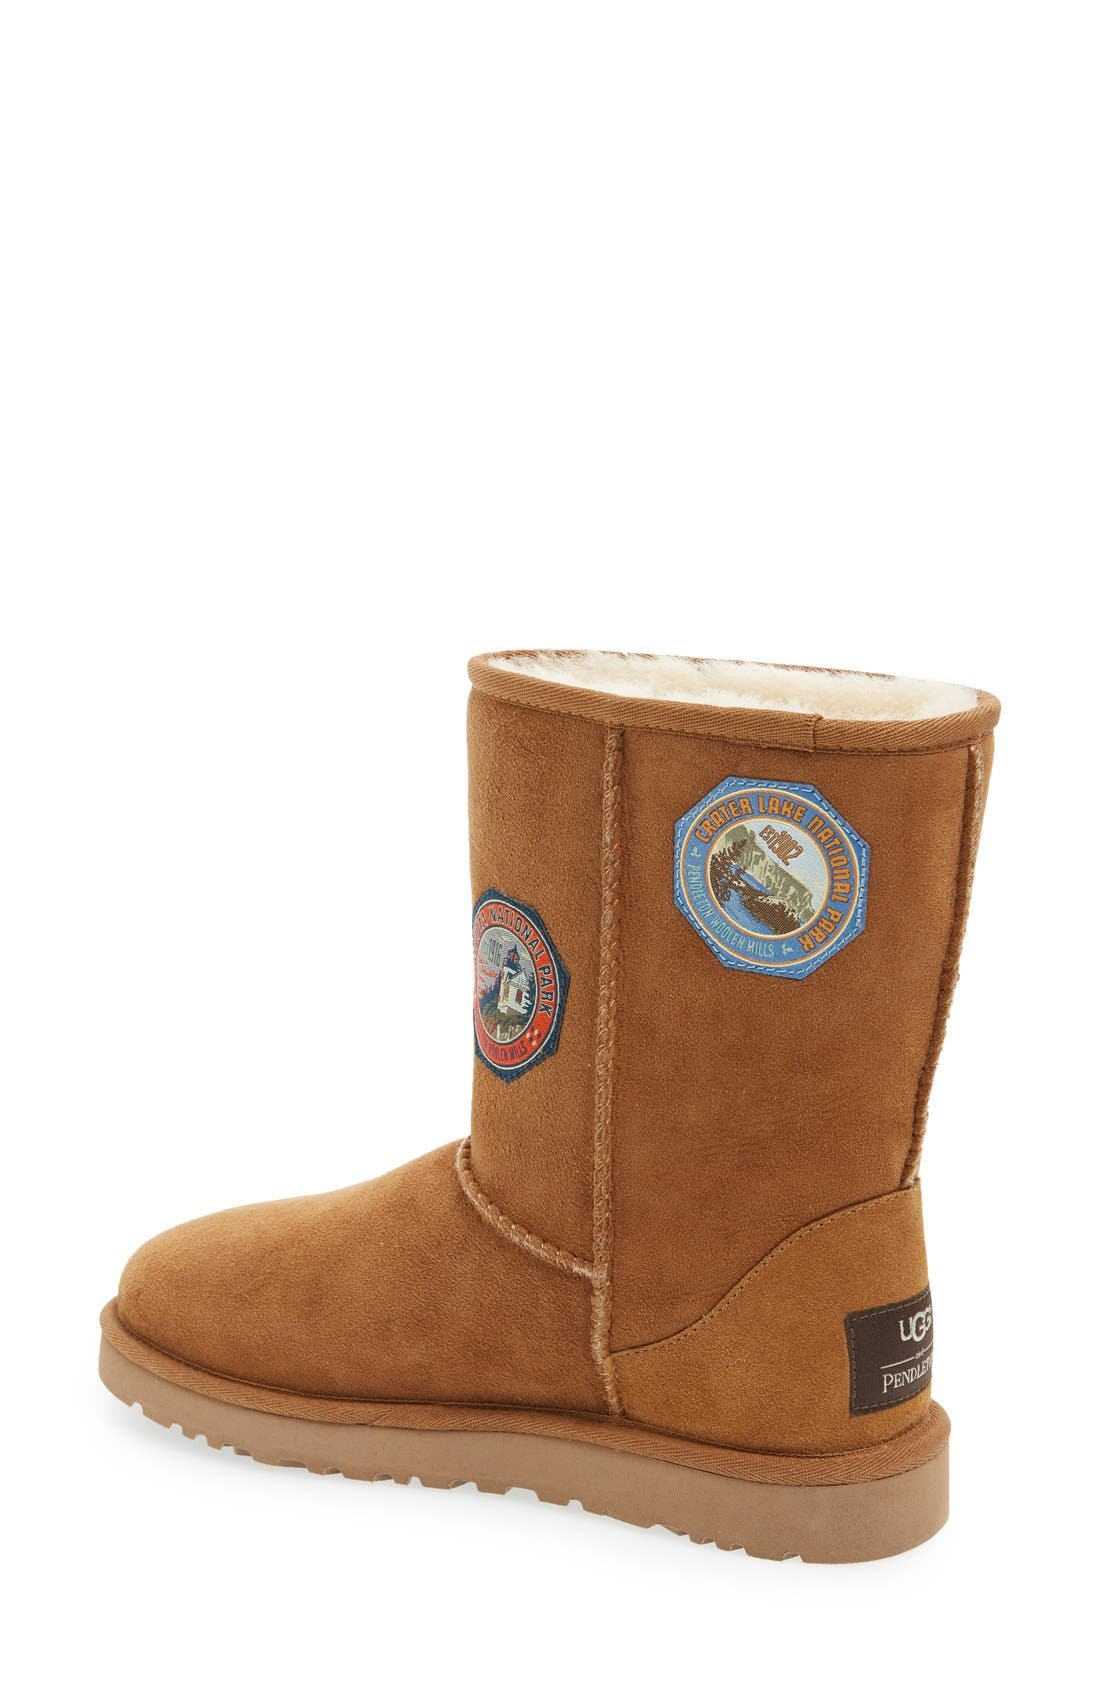 Alternate Image 2  - UGG® x Pendleton 'Classic Short - Patch' Boot (Women)